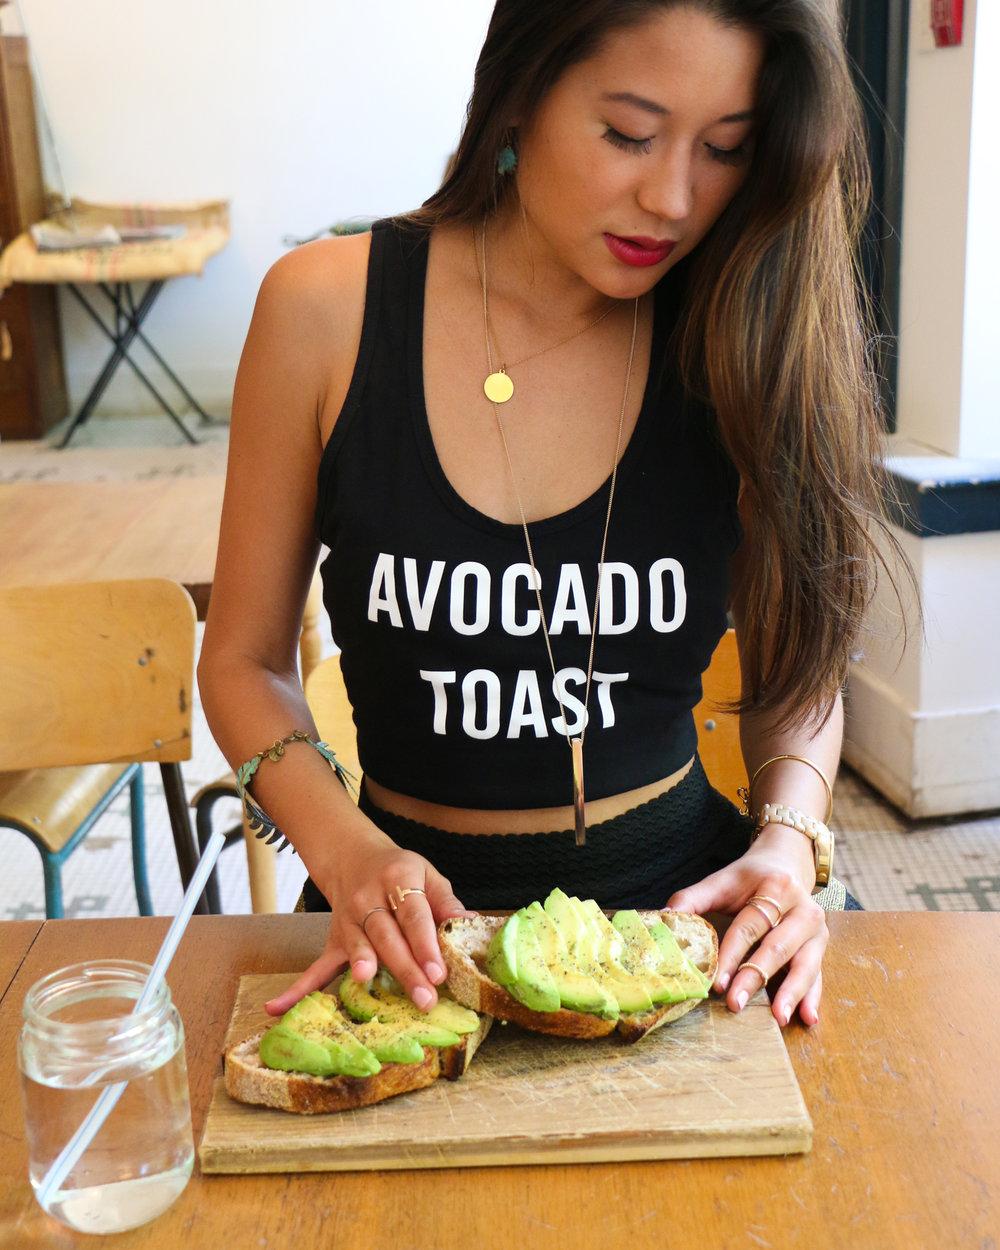 rachelle-avocado-toast.jpg